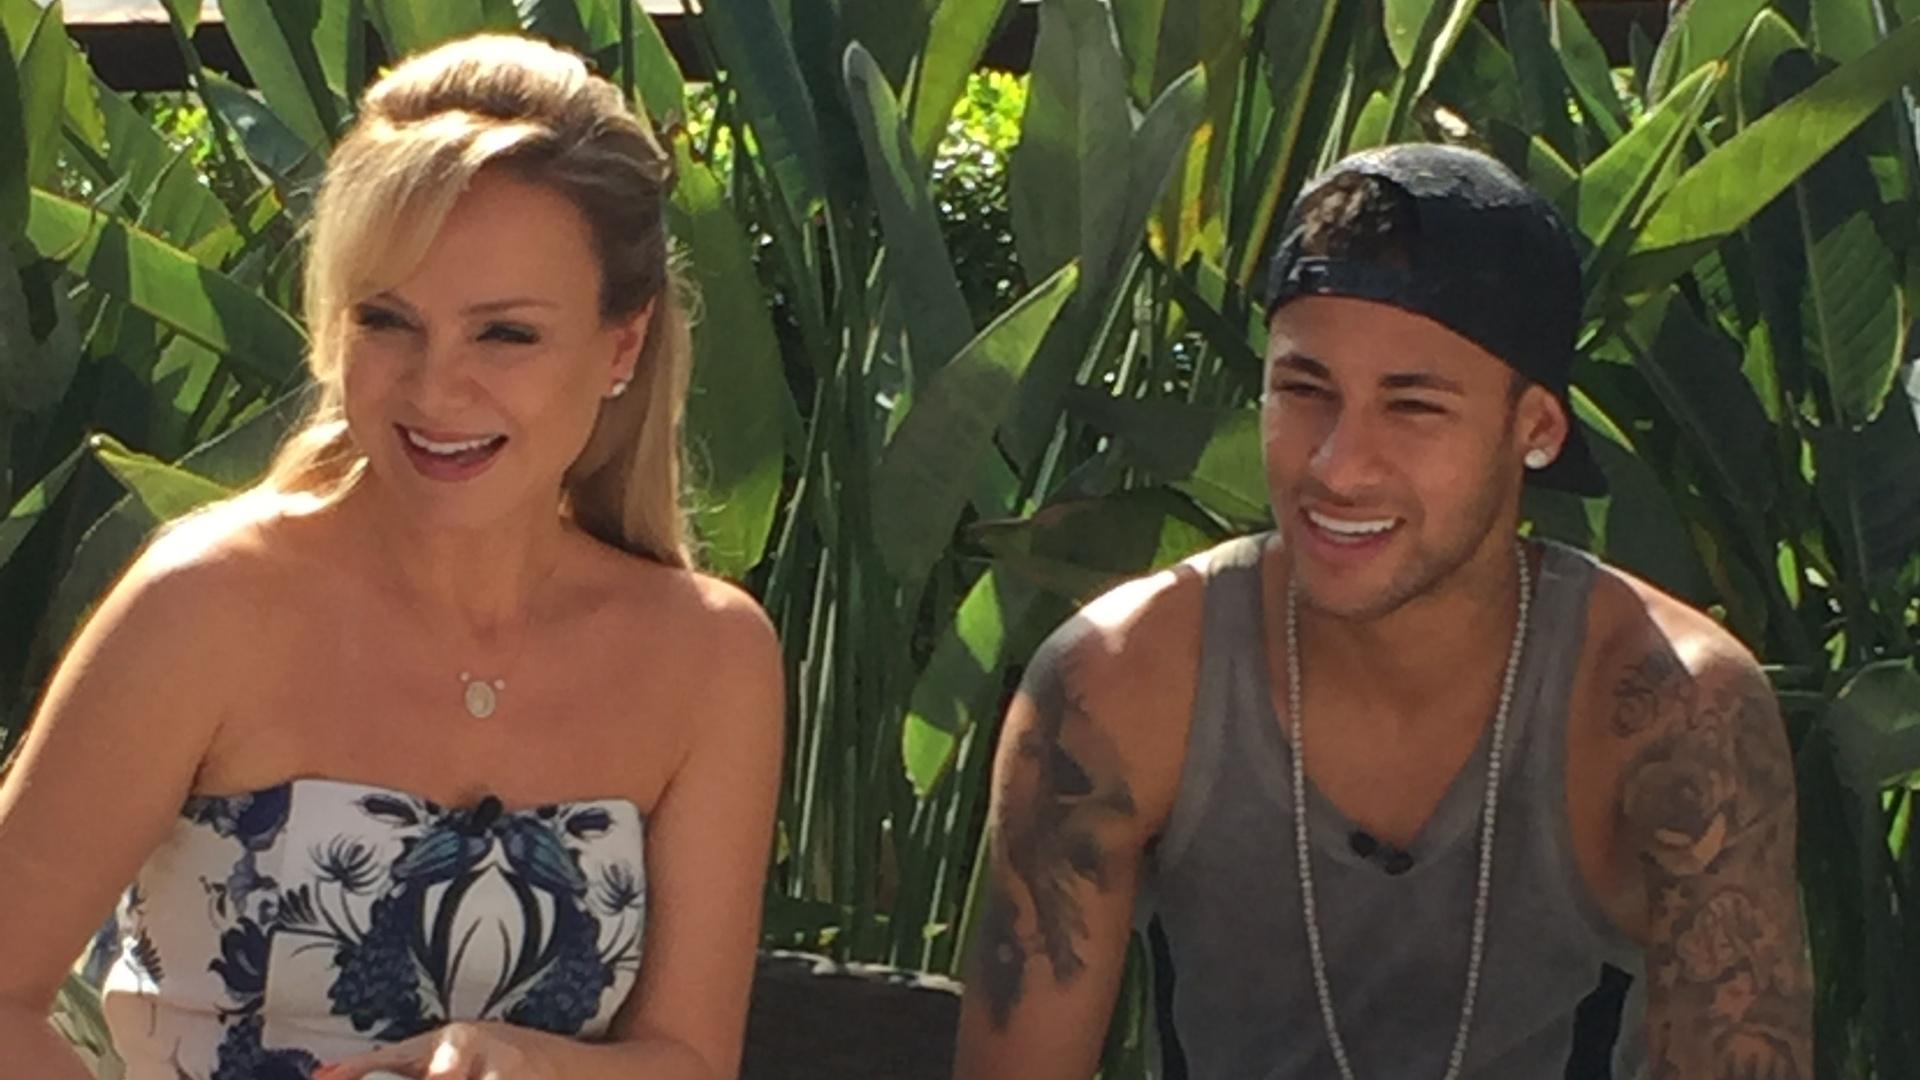 Eliana entrevista Neymar Jr. para seu programa no SBT